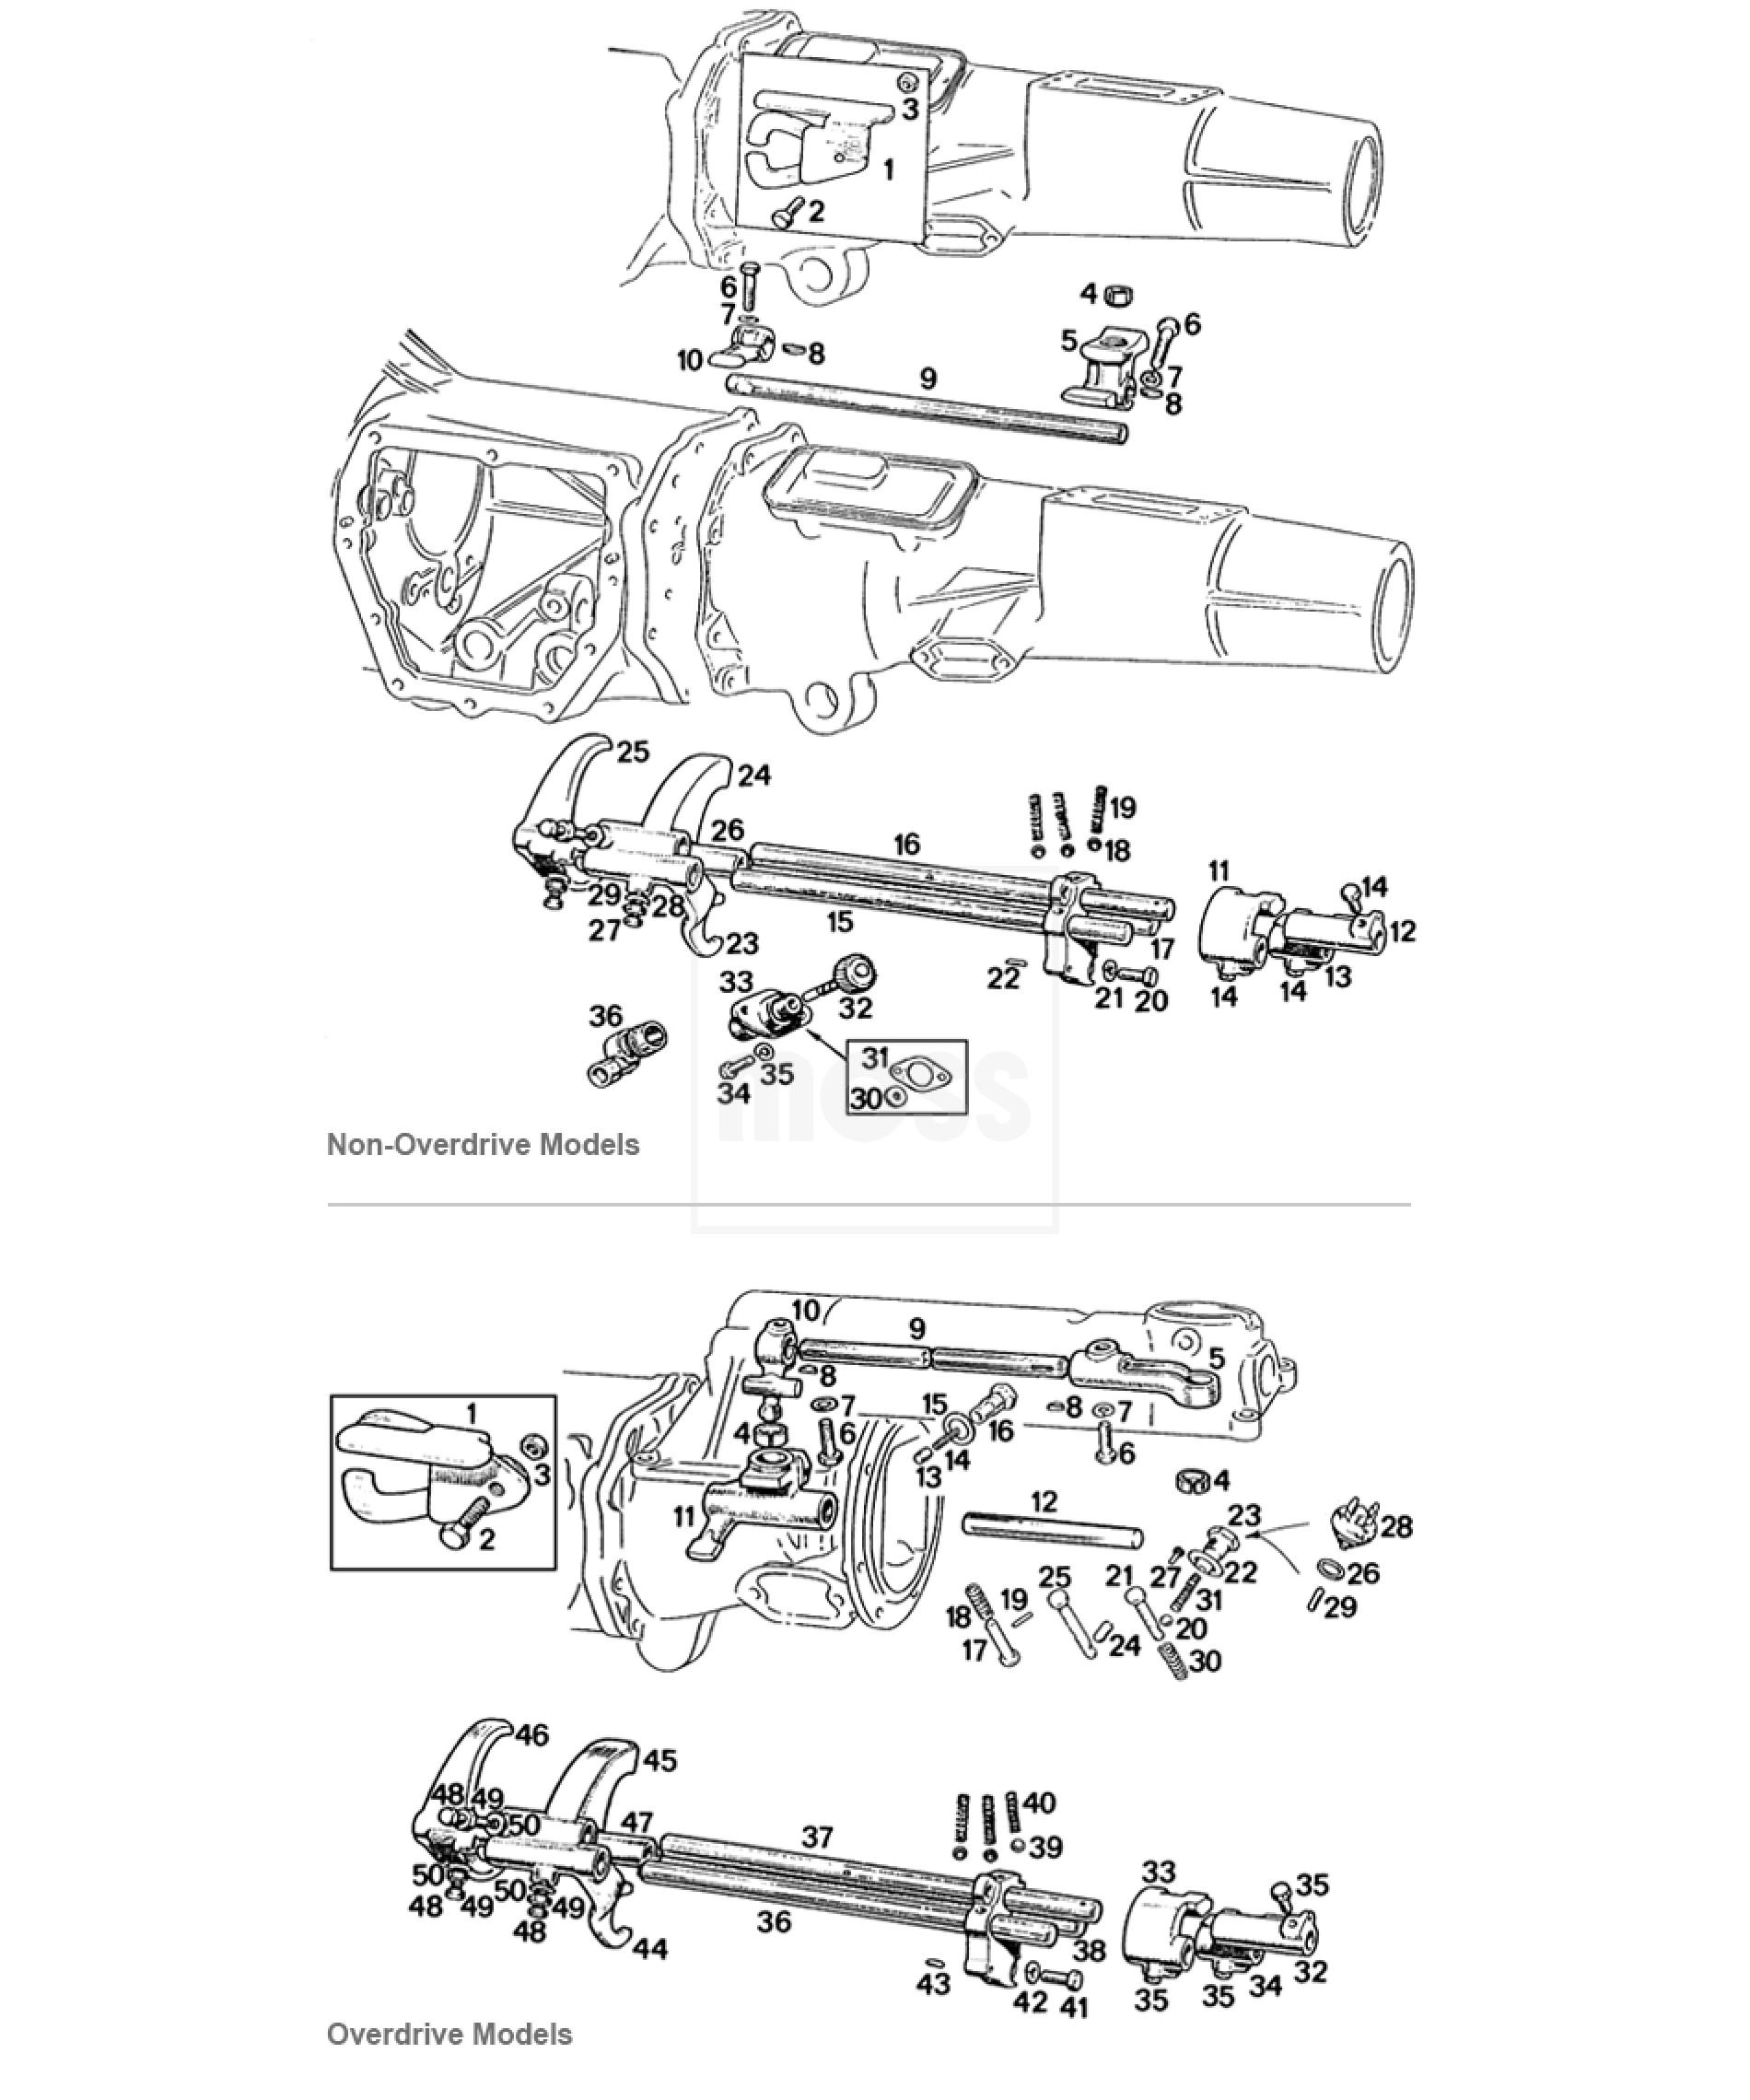 Internal Gearbox 3 Synchro Gear Selector Rods